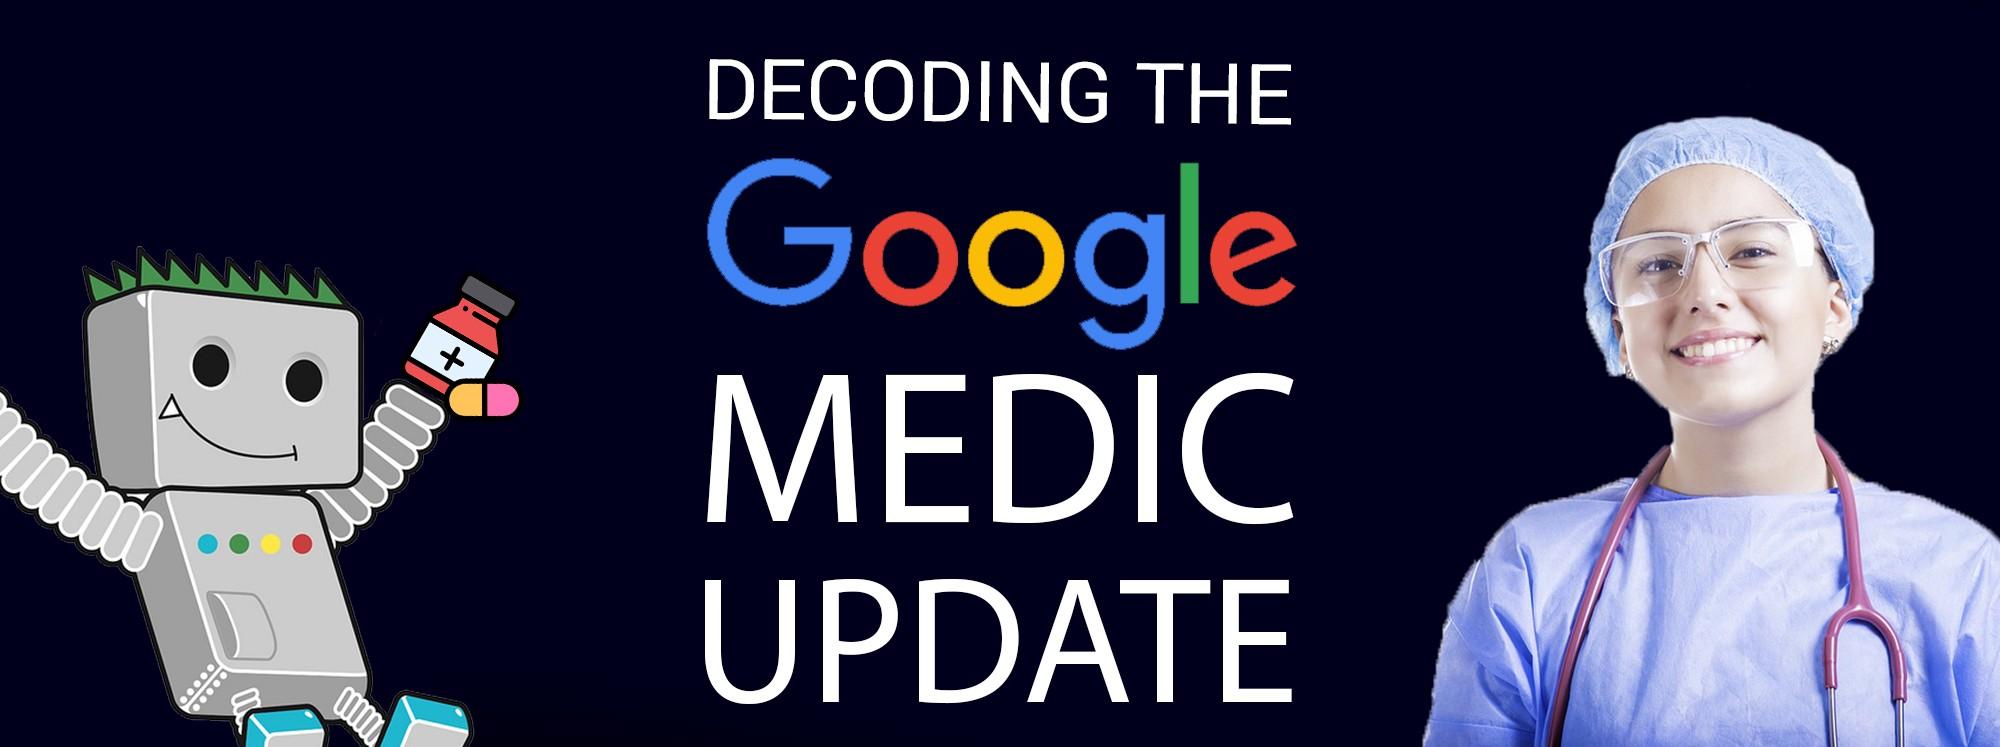 decodage-algorithme-google-medic